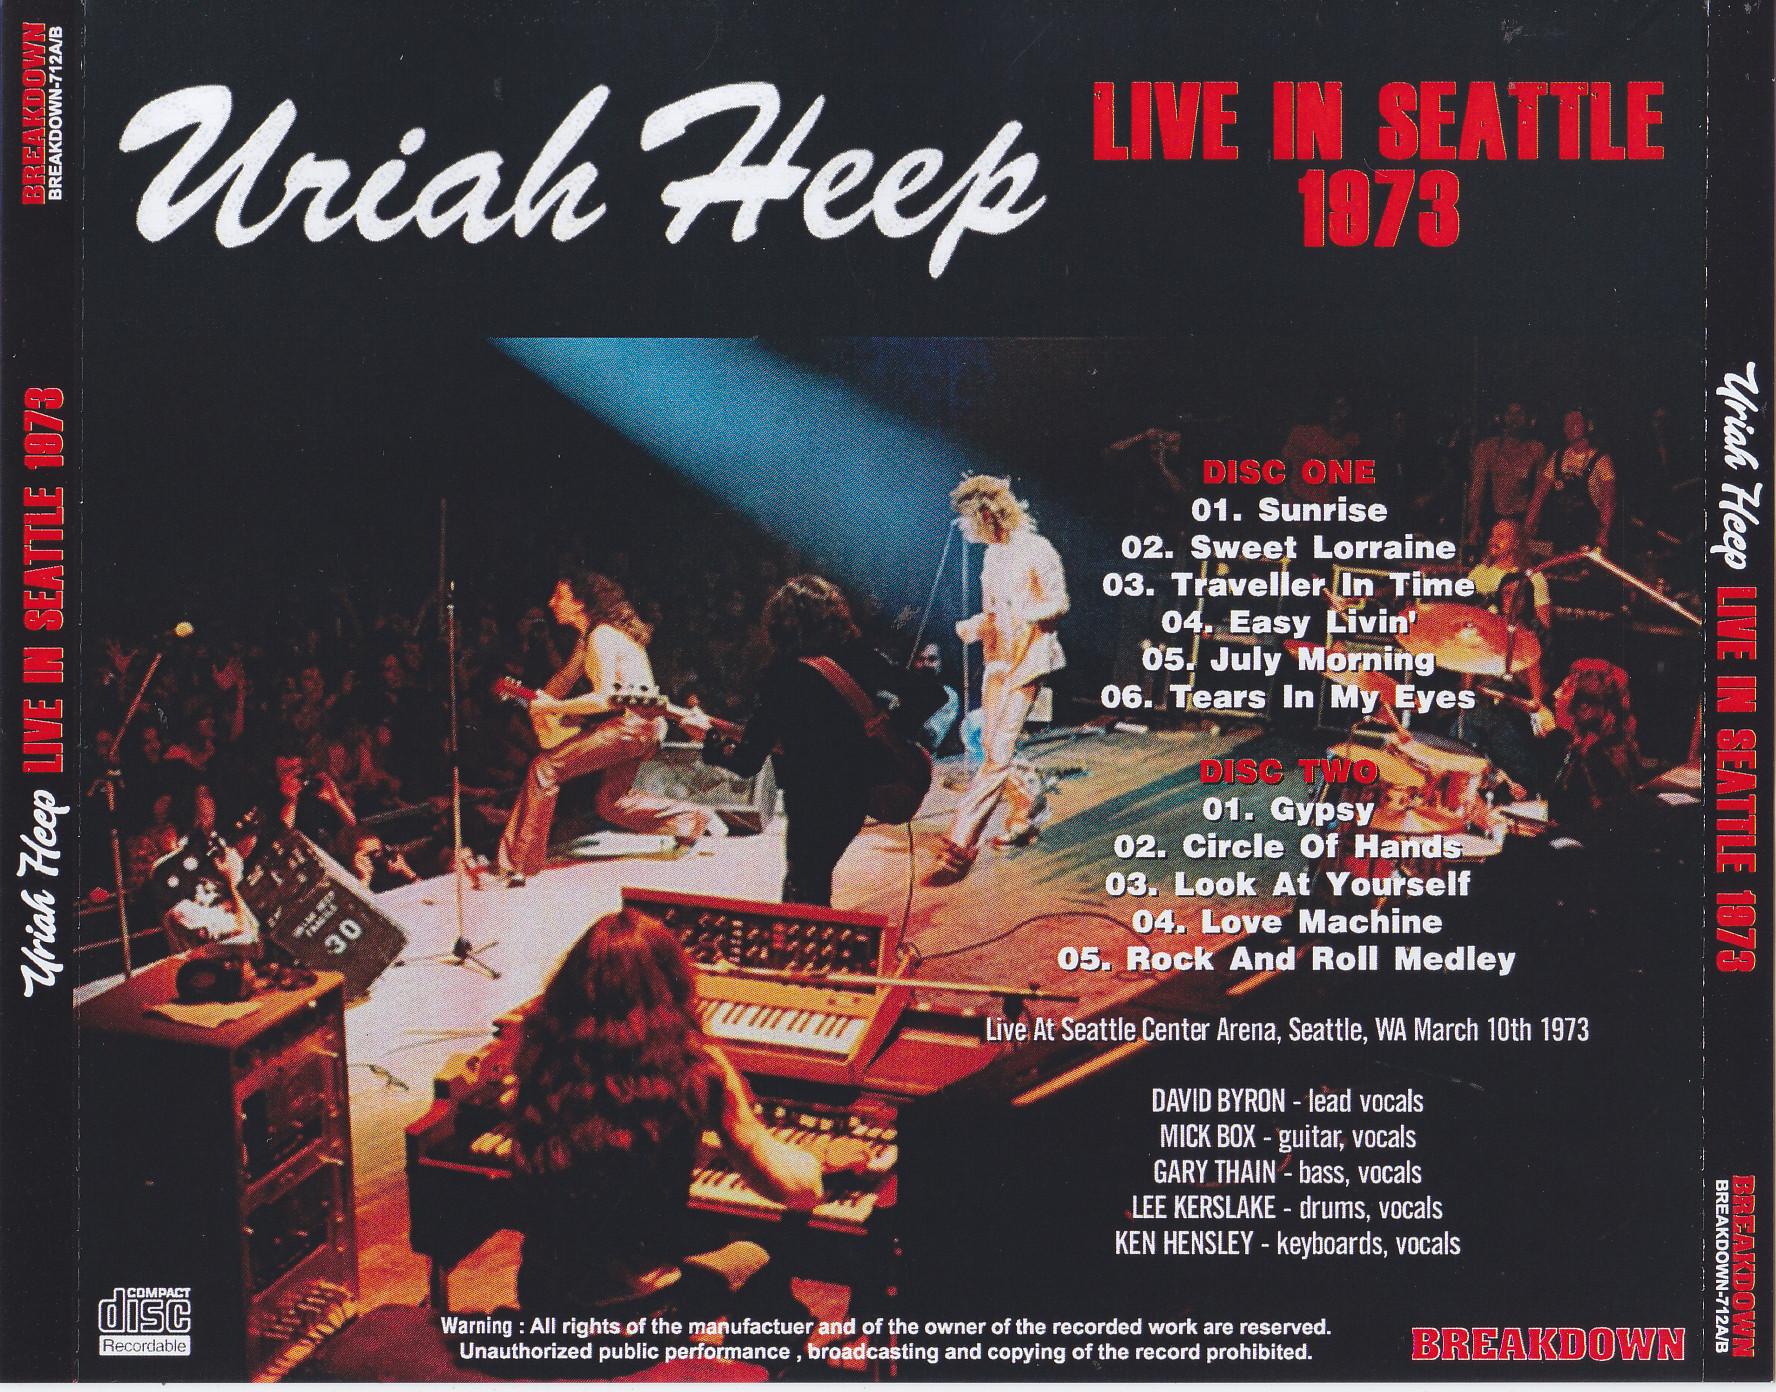 Uriah Heep Live In Seattle 1973 2pro Cdr Breakdown 712a B Discjapan